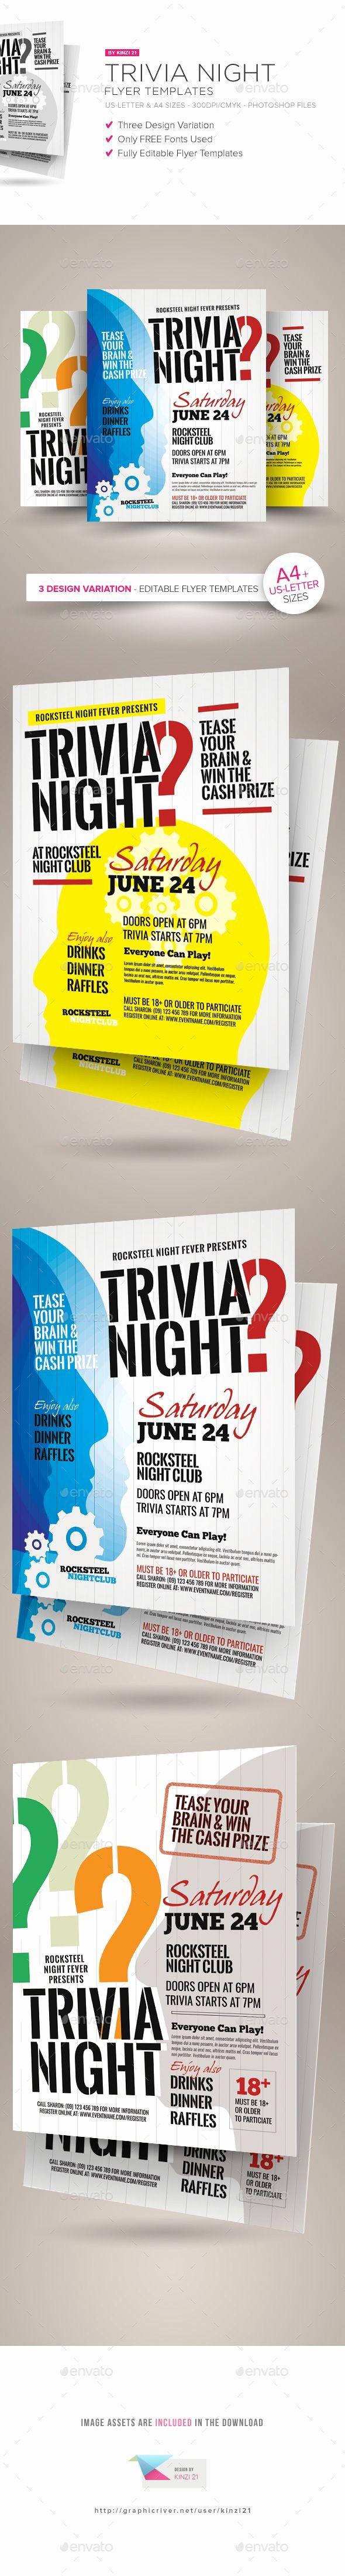 Trivia Night Flyer Template Free Elegant Trivia Night Flyer Templates